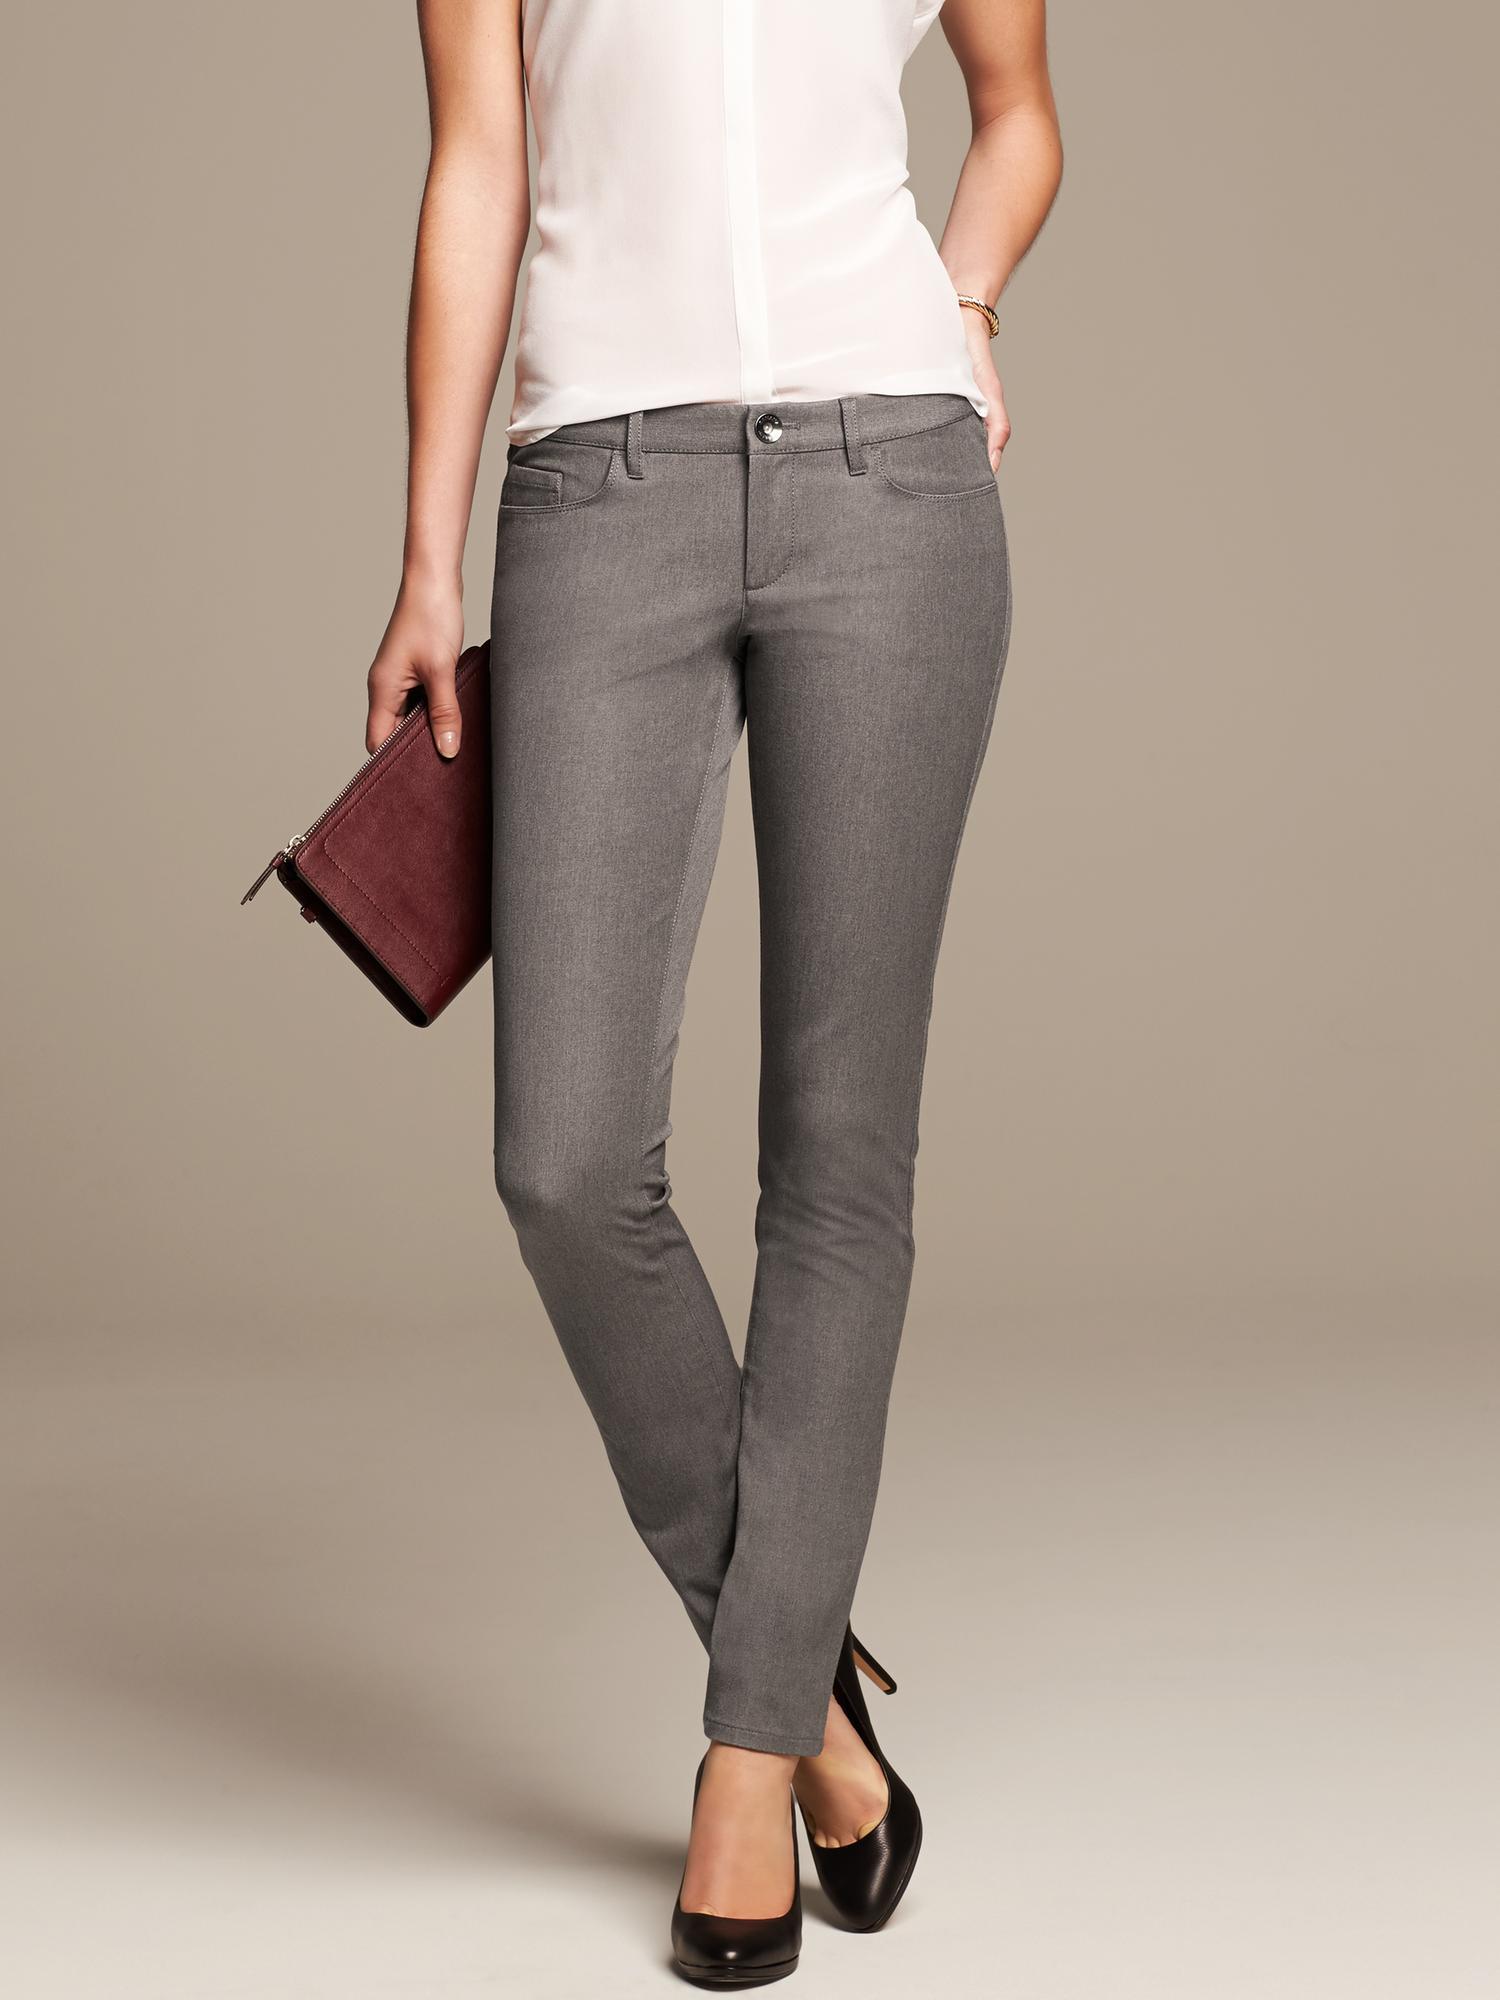 Banana Republic Sloan Fit Gray Skinny Pant in Gray Rich